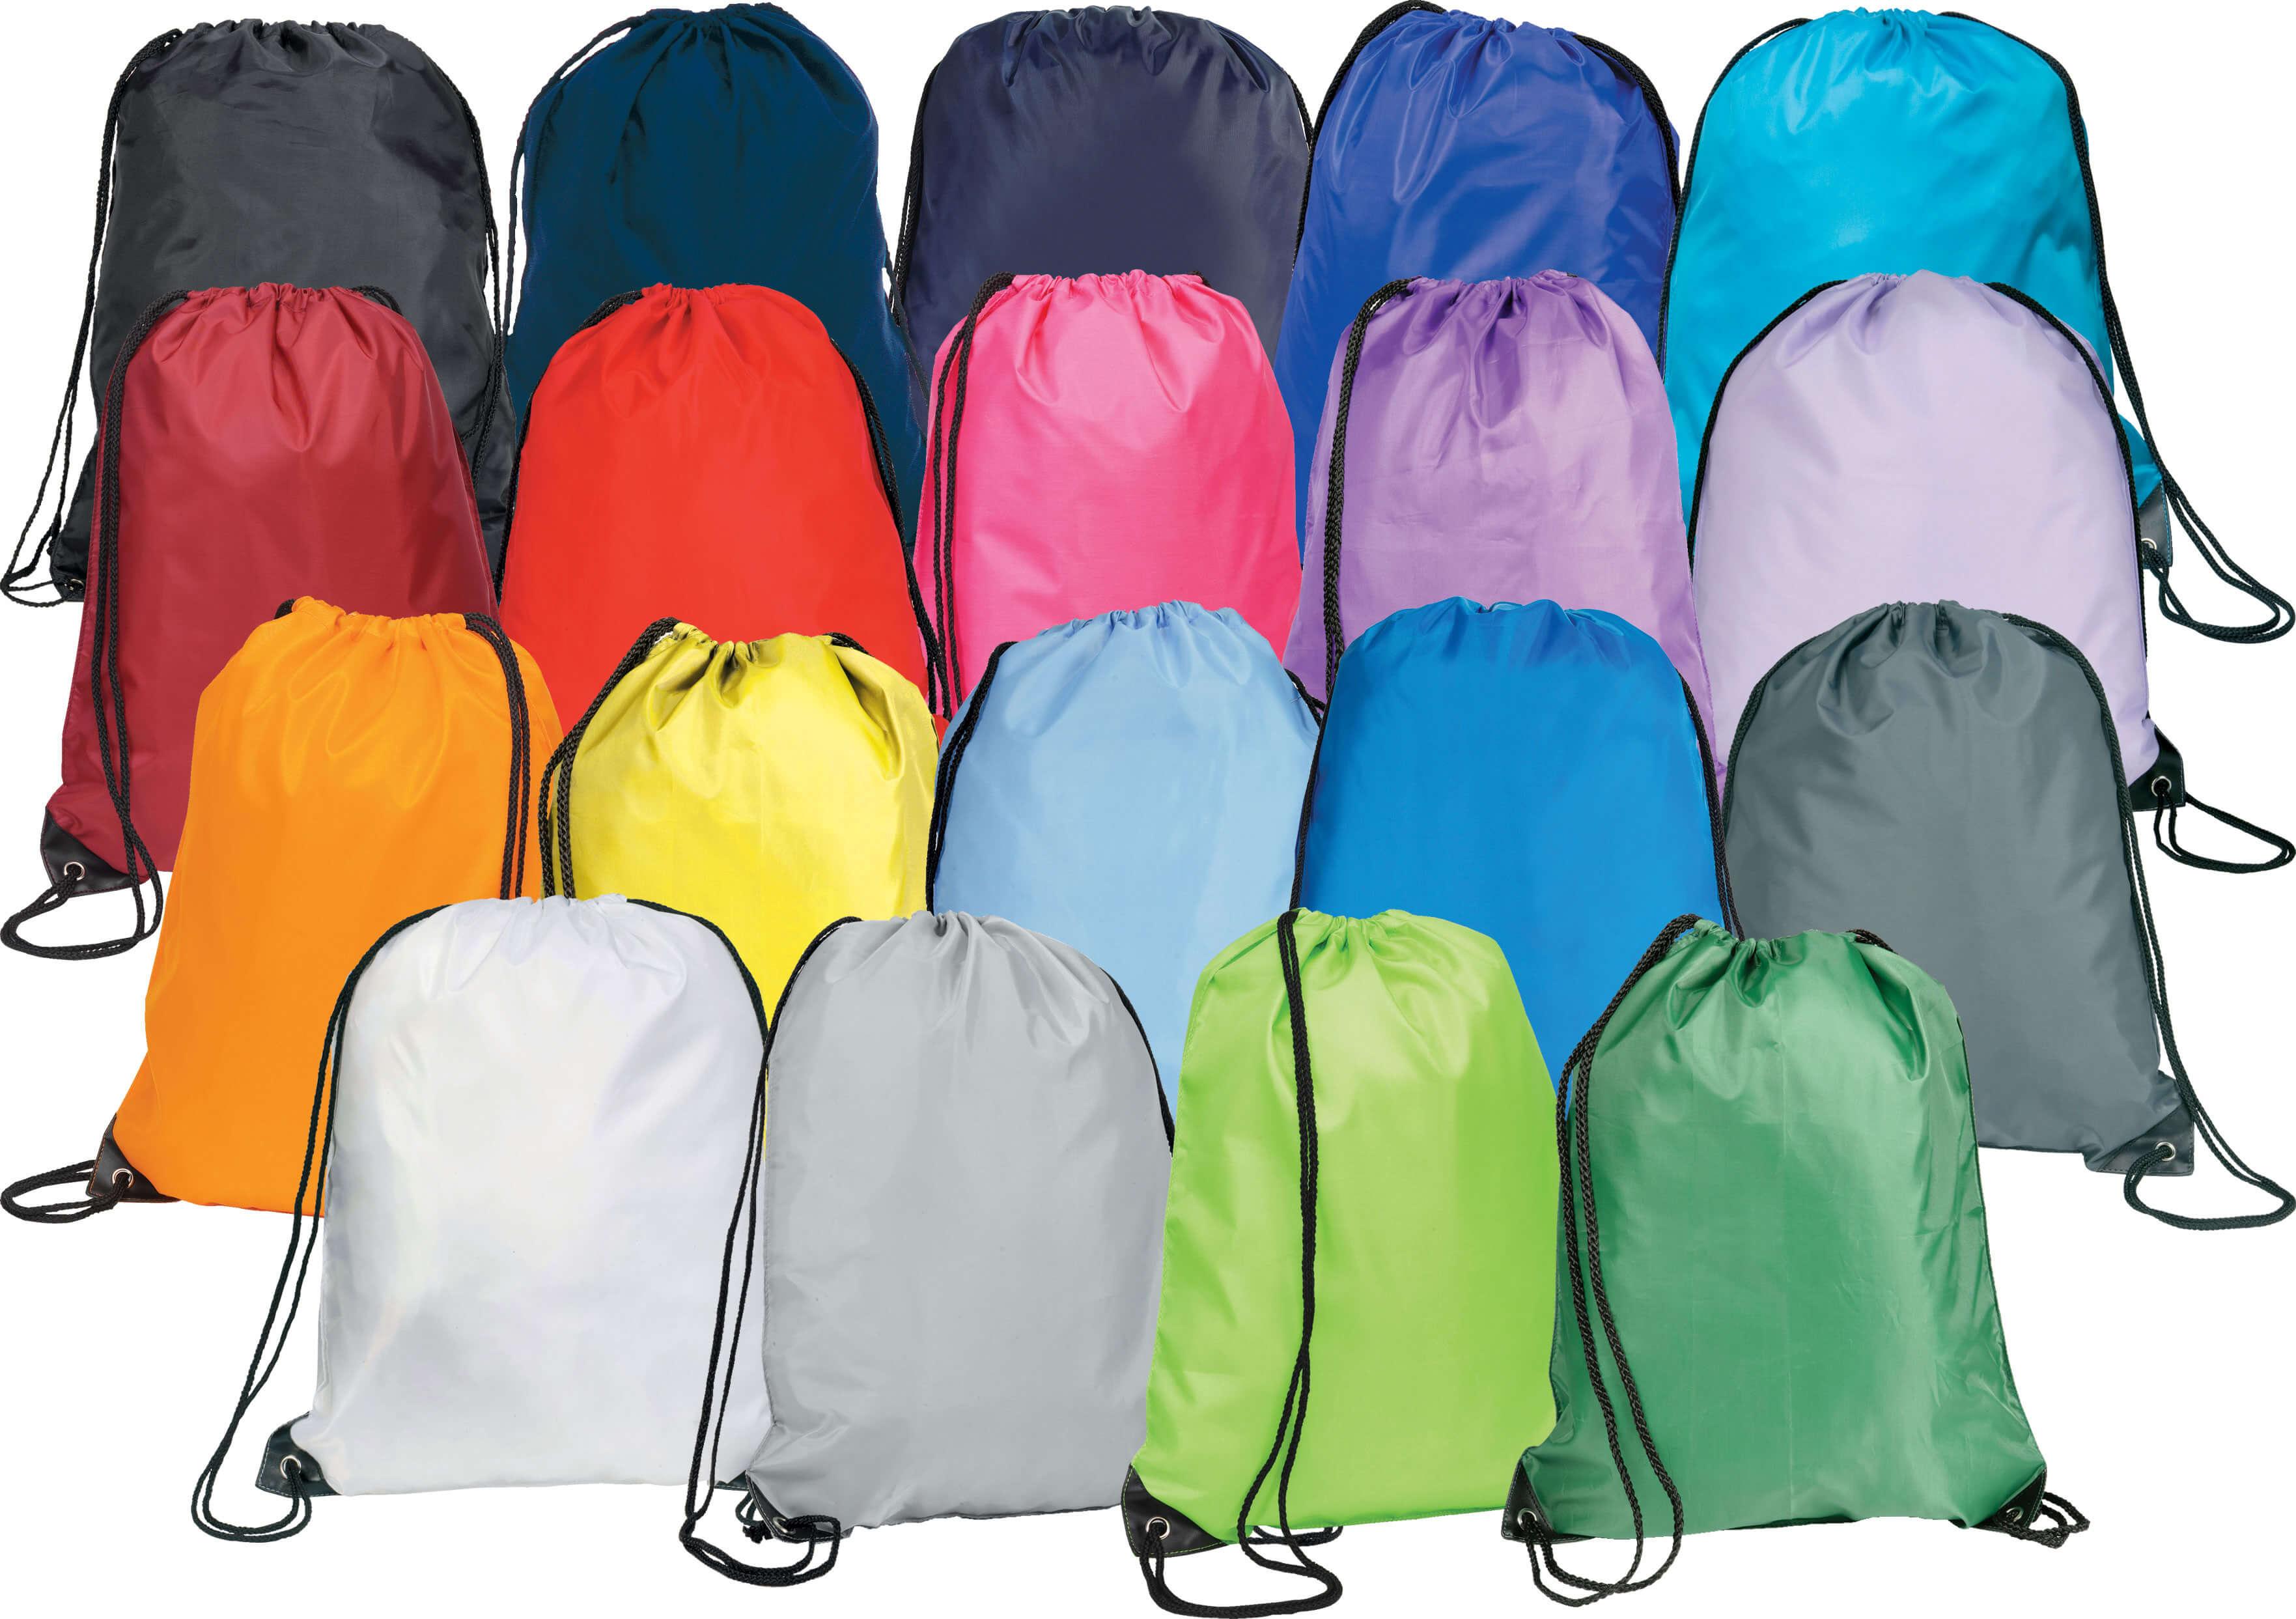 4ad26c34d2ac0a Eynsford Drawstring Backpack Rucksack - Aspect CPM